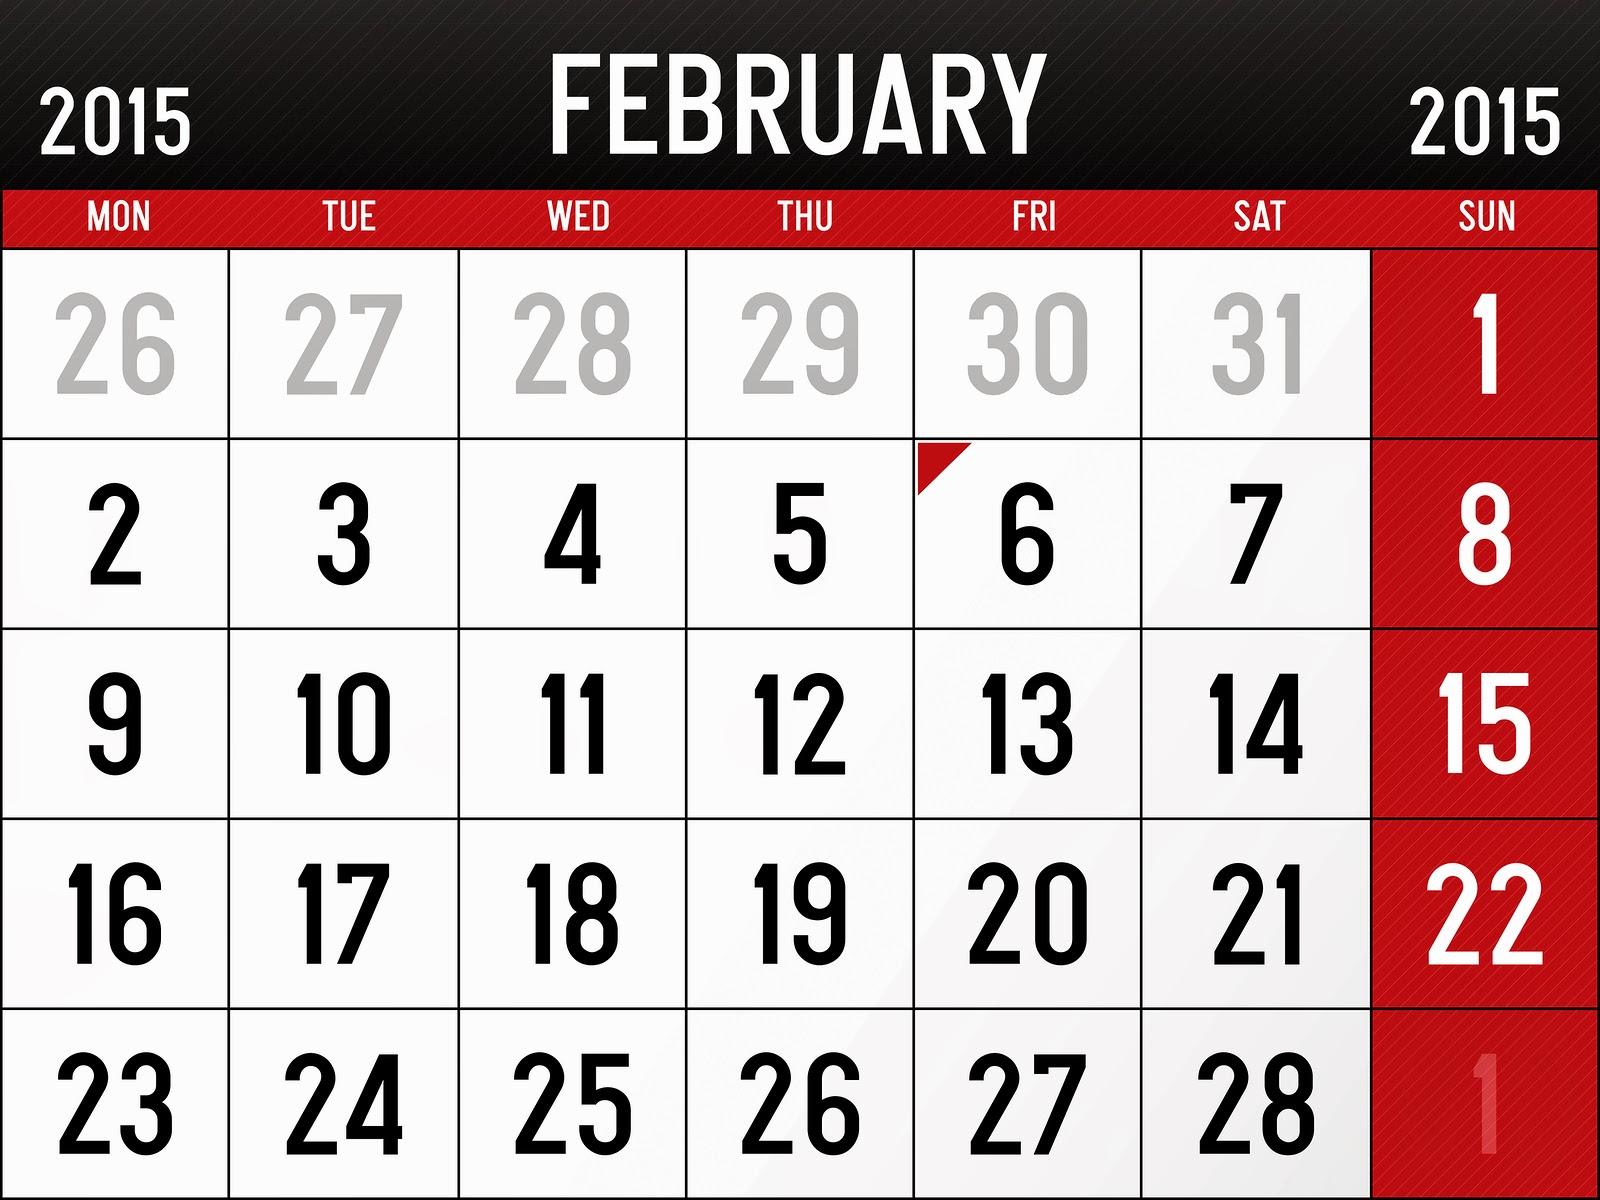 February 2015 Calendar   Download Wallpaper 1600x1200